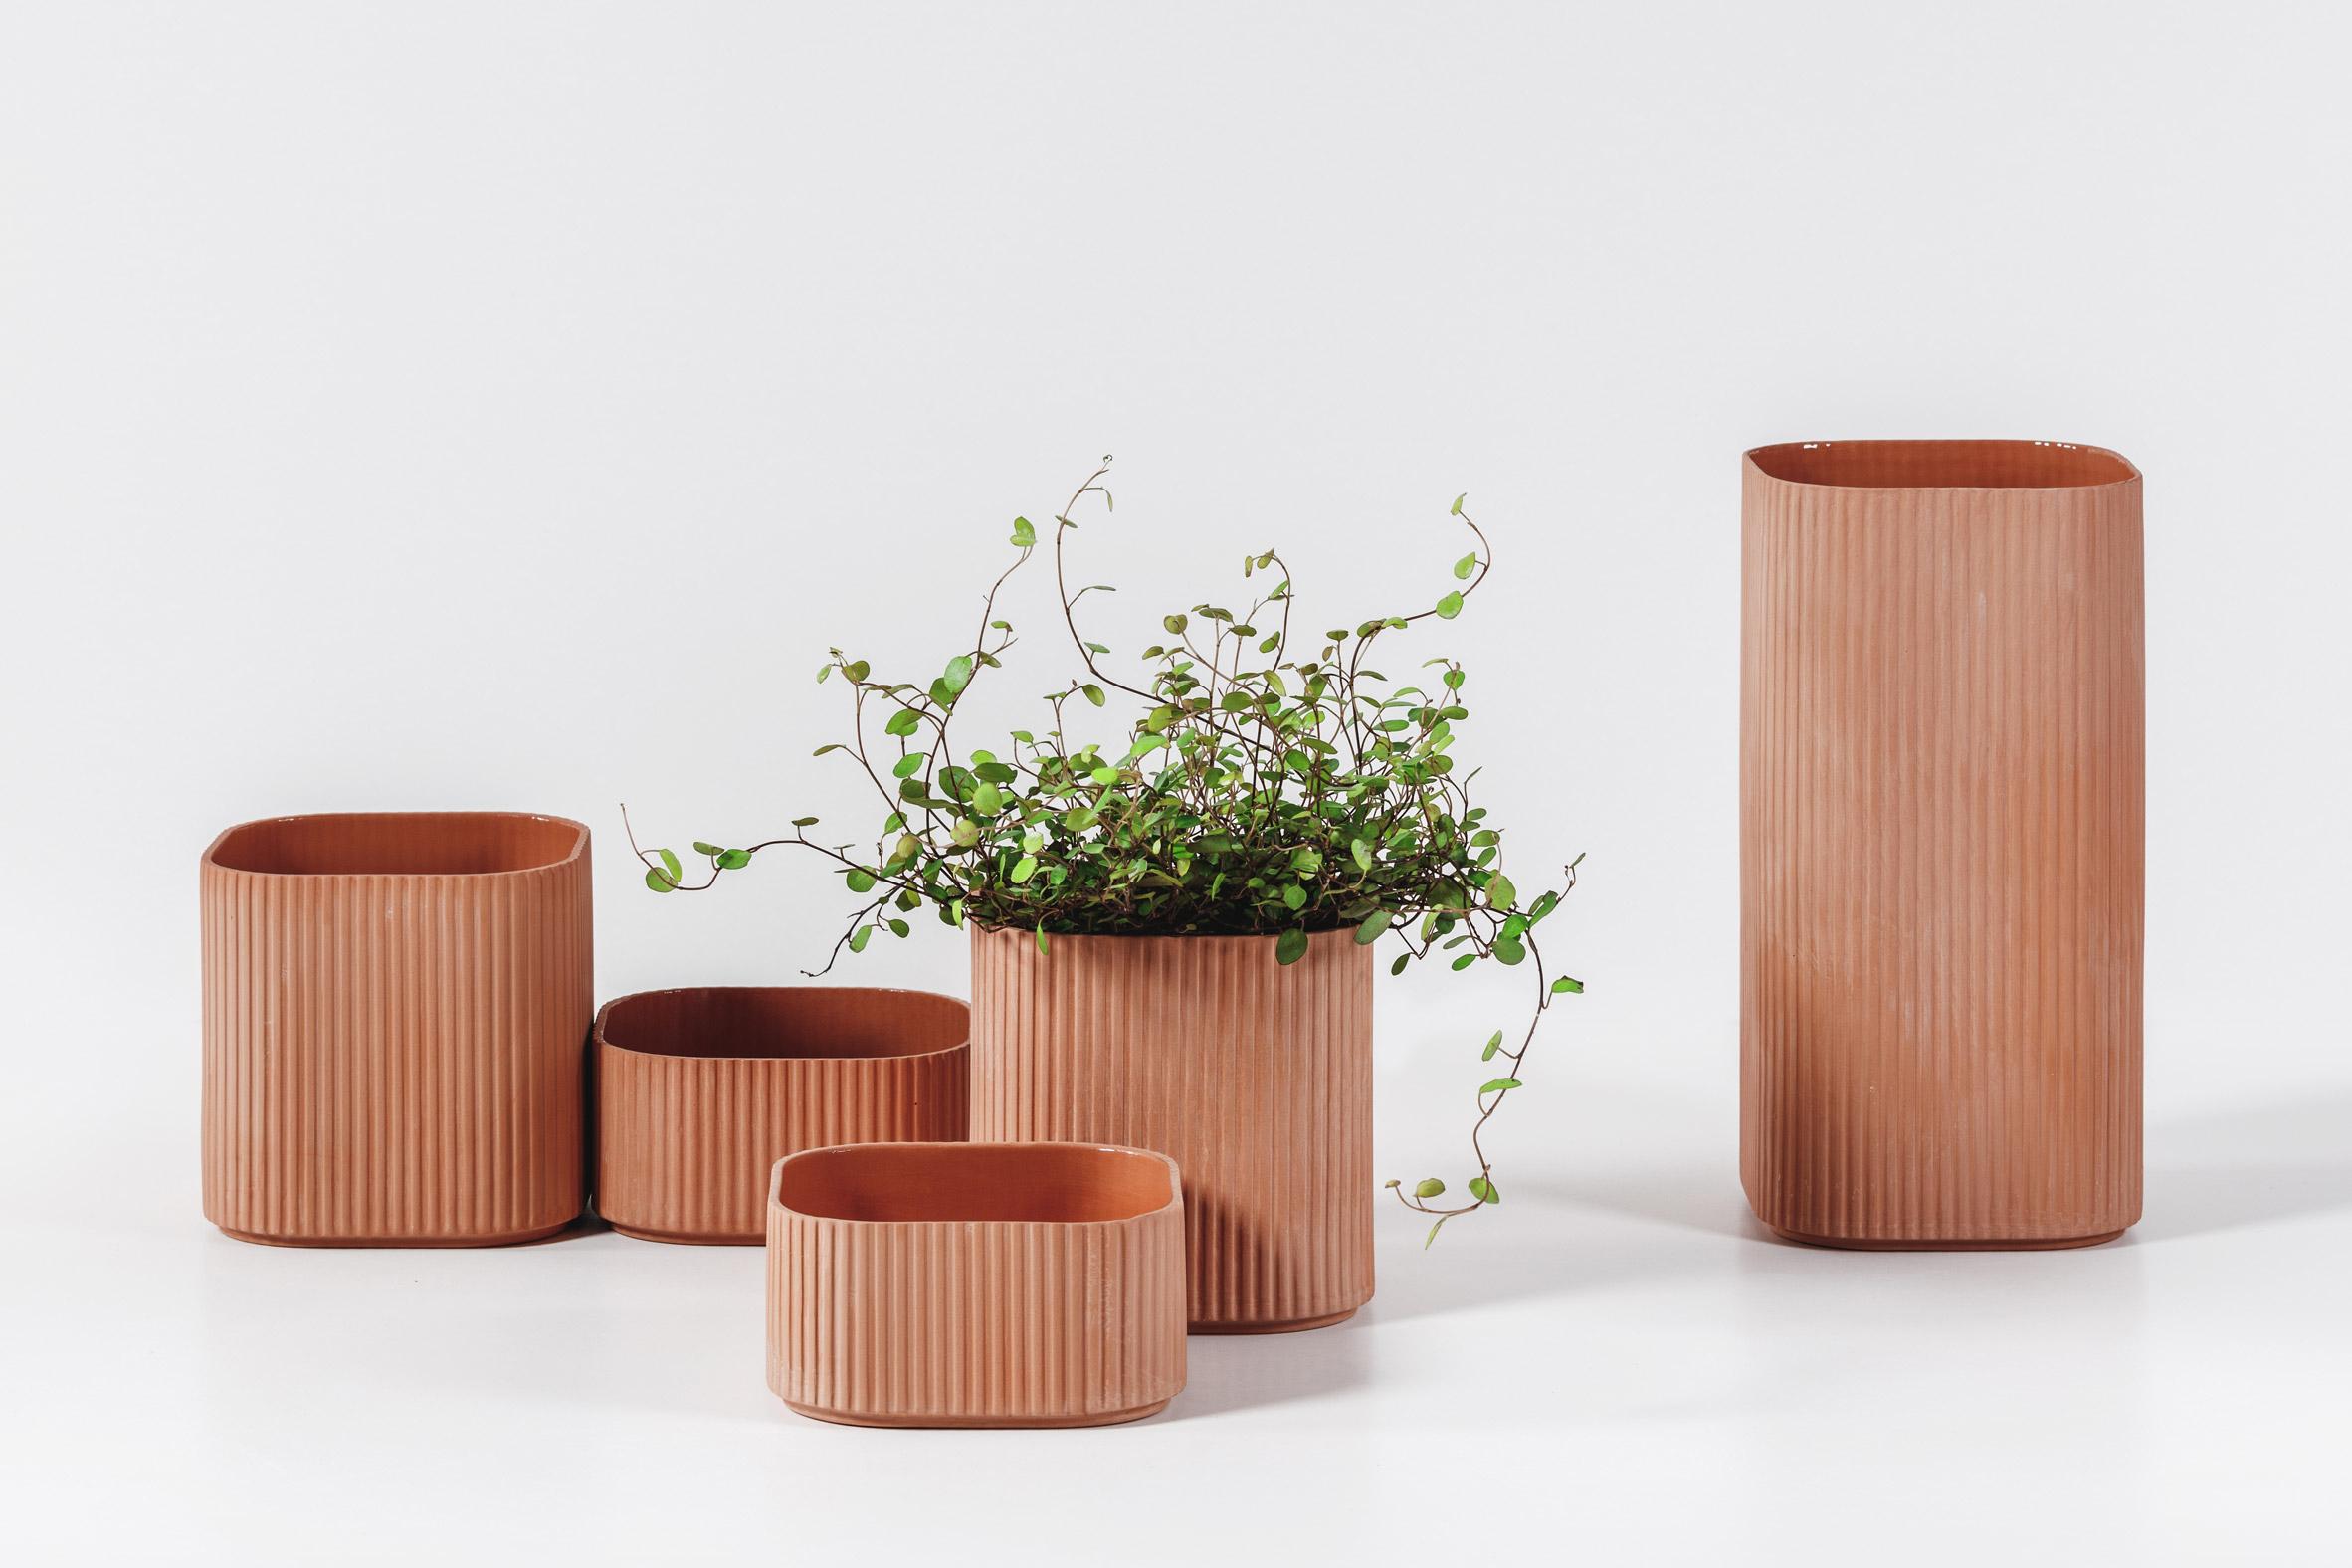 kilo-and-kobe-flowerpots-plant-pot-design-homeware_dezeen_2364_col_0.jpg